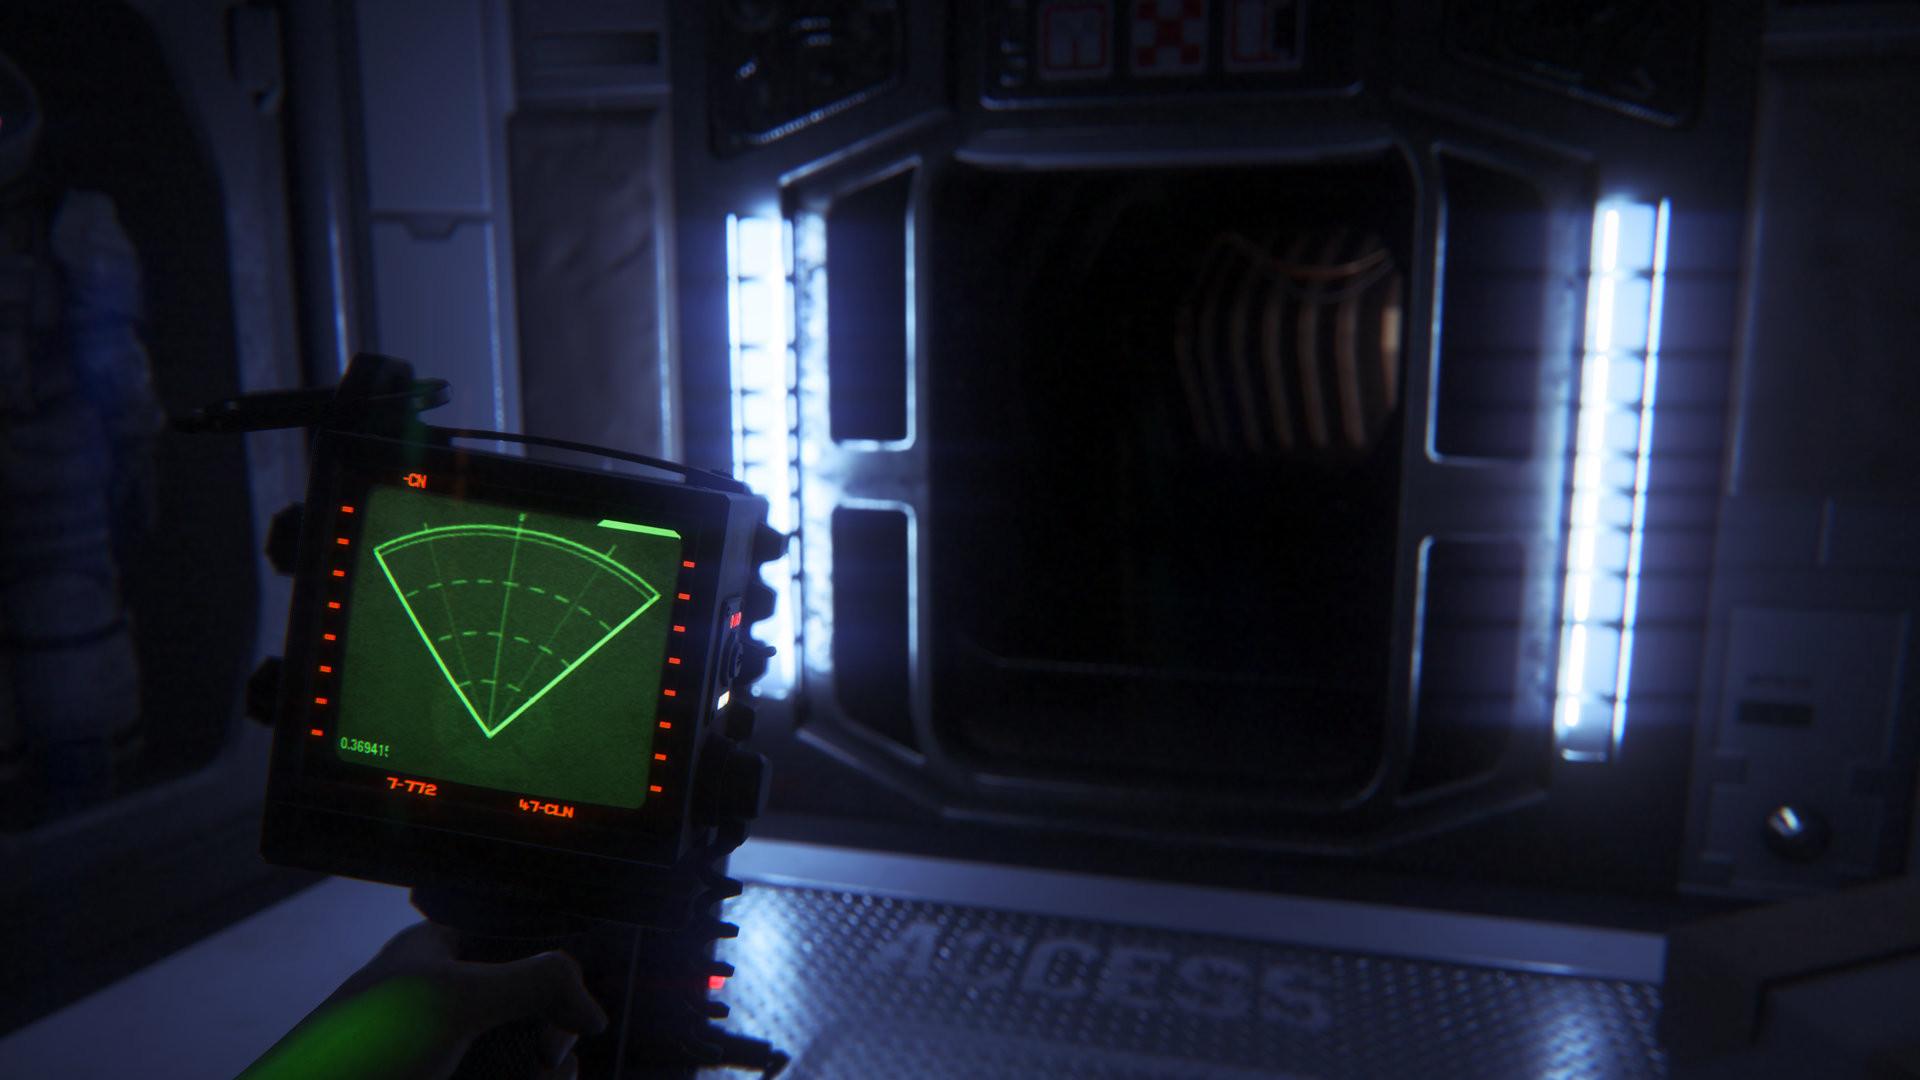 alien-isolation-screen-02-ps4-eu-06nov14